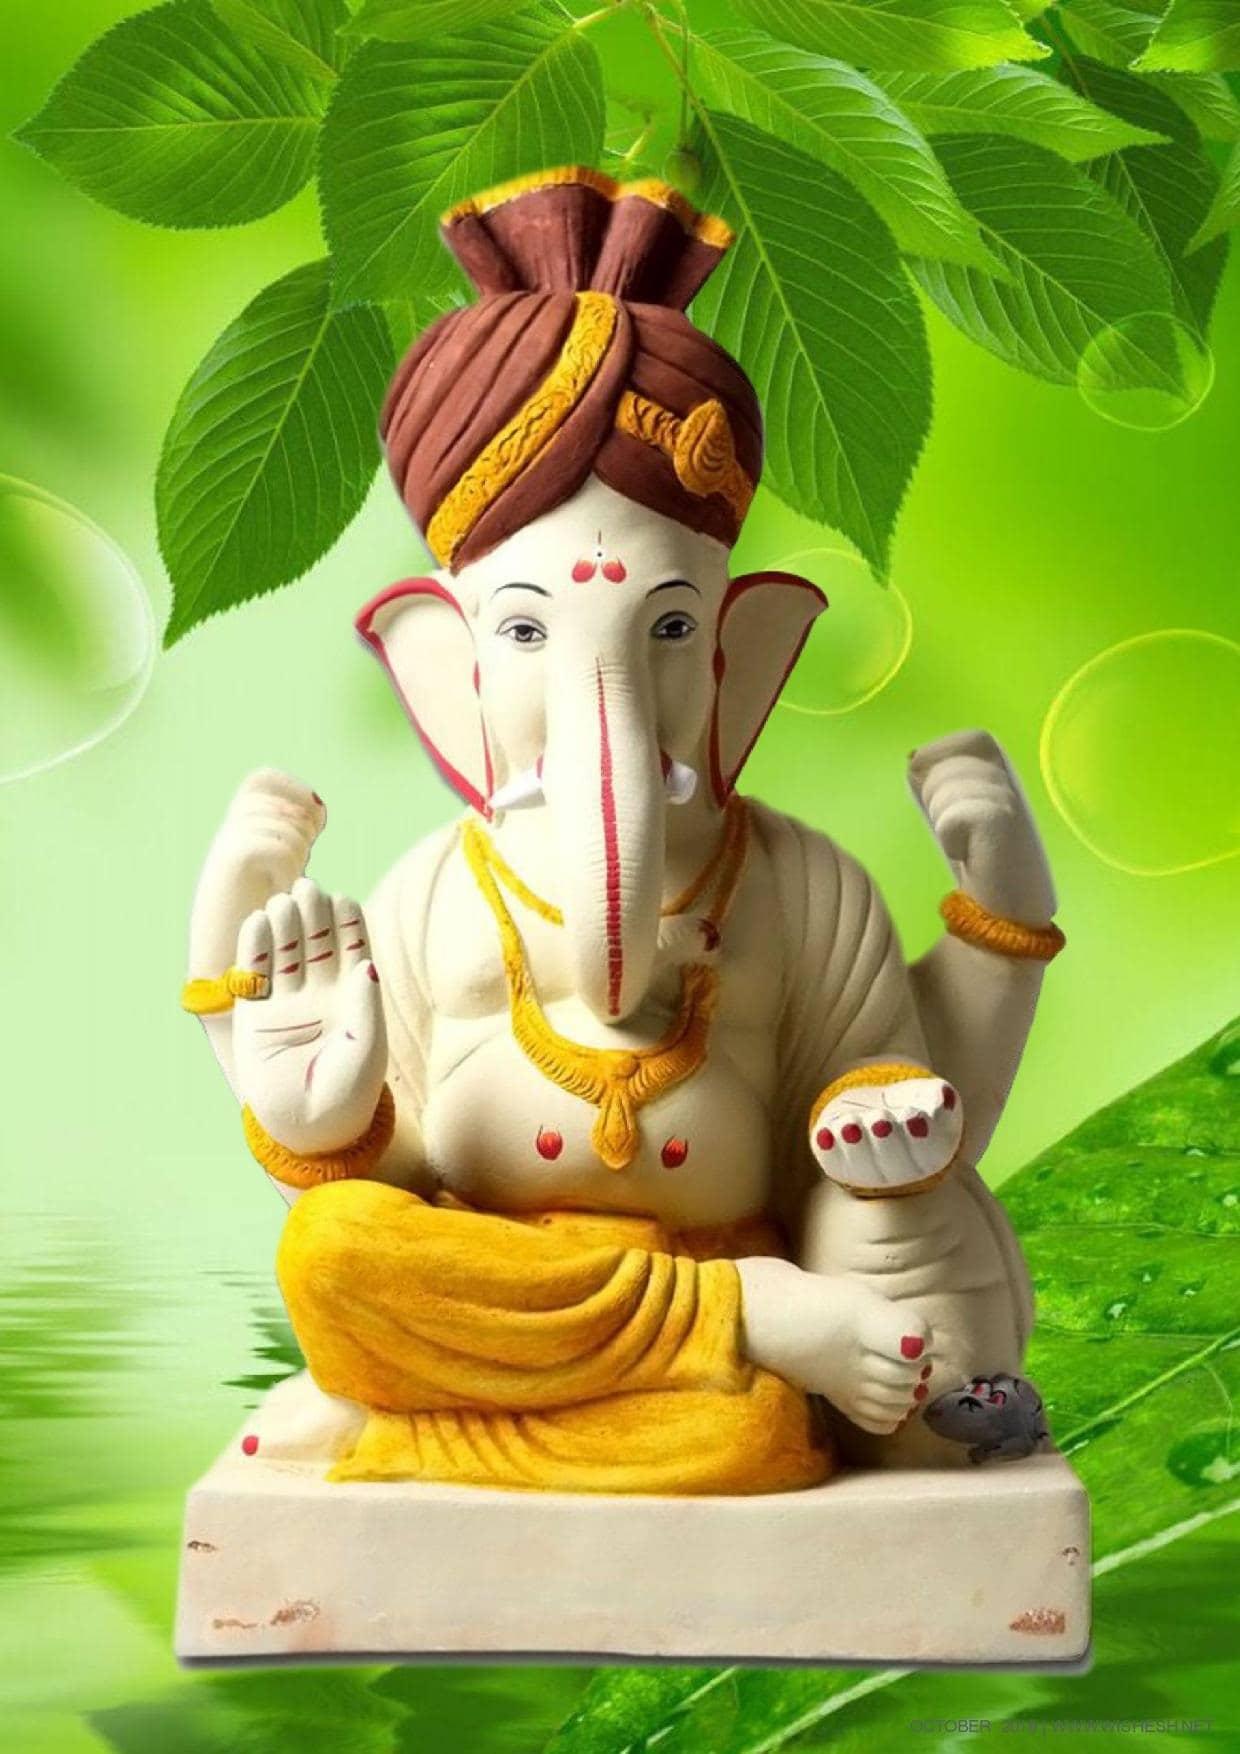 Ganpati Bappa Moriya-With Eco-Friendly Idols